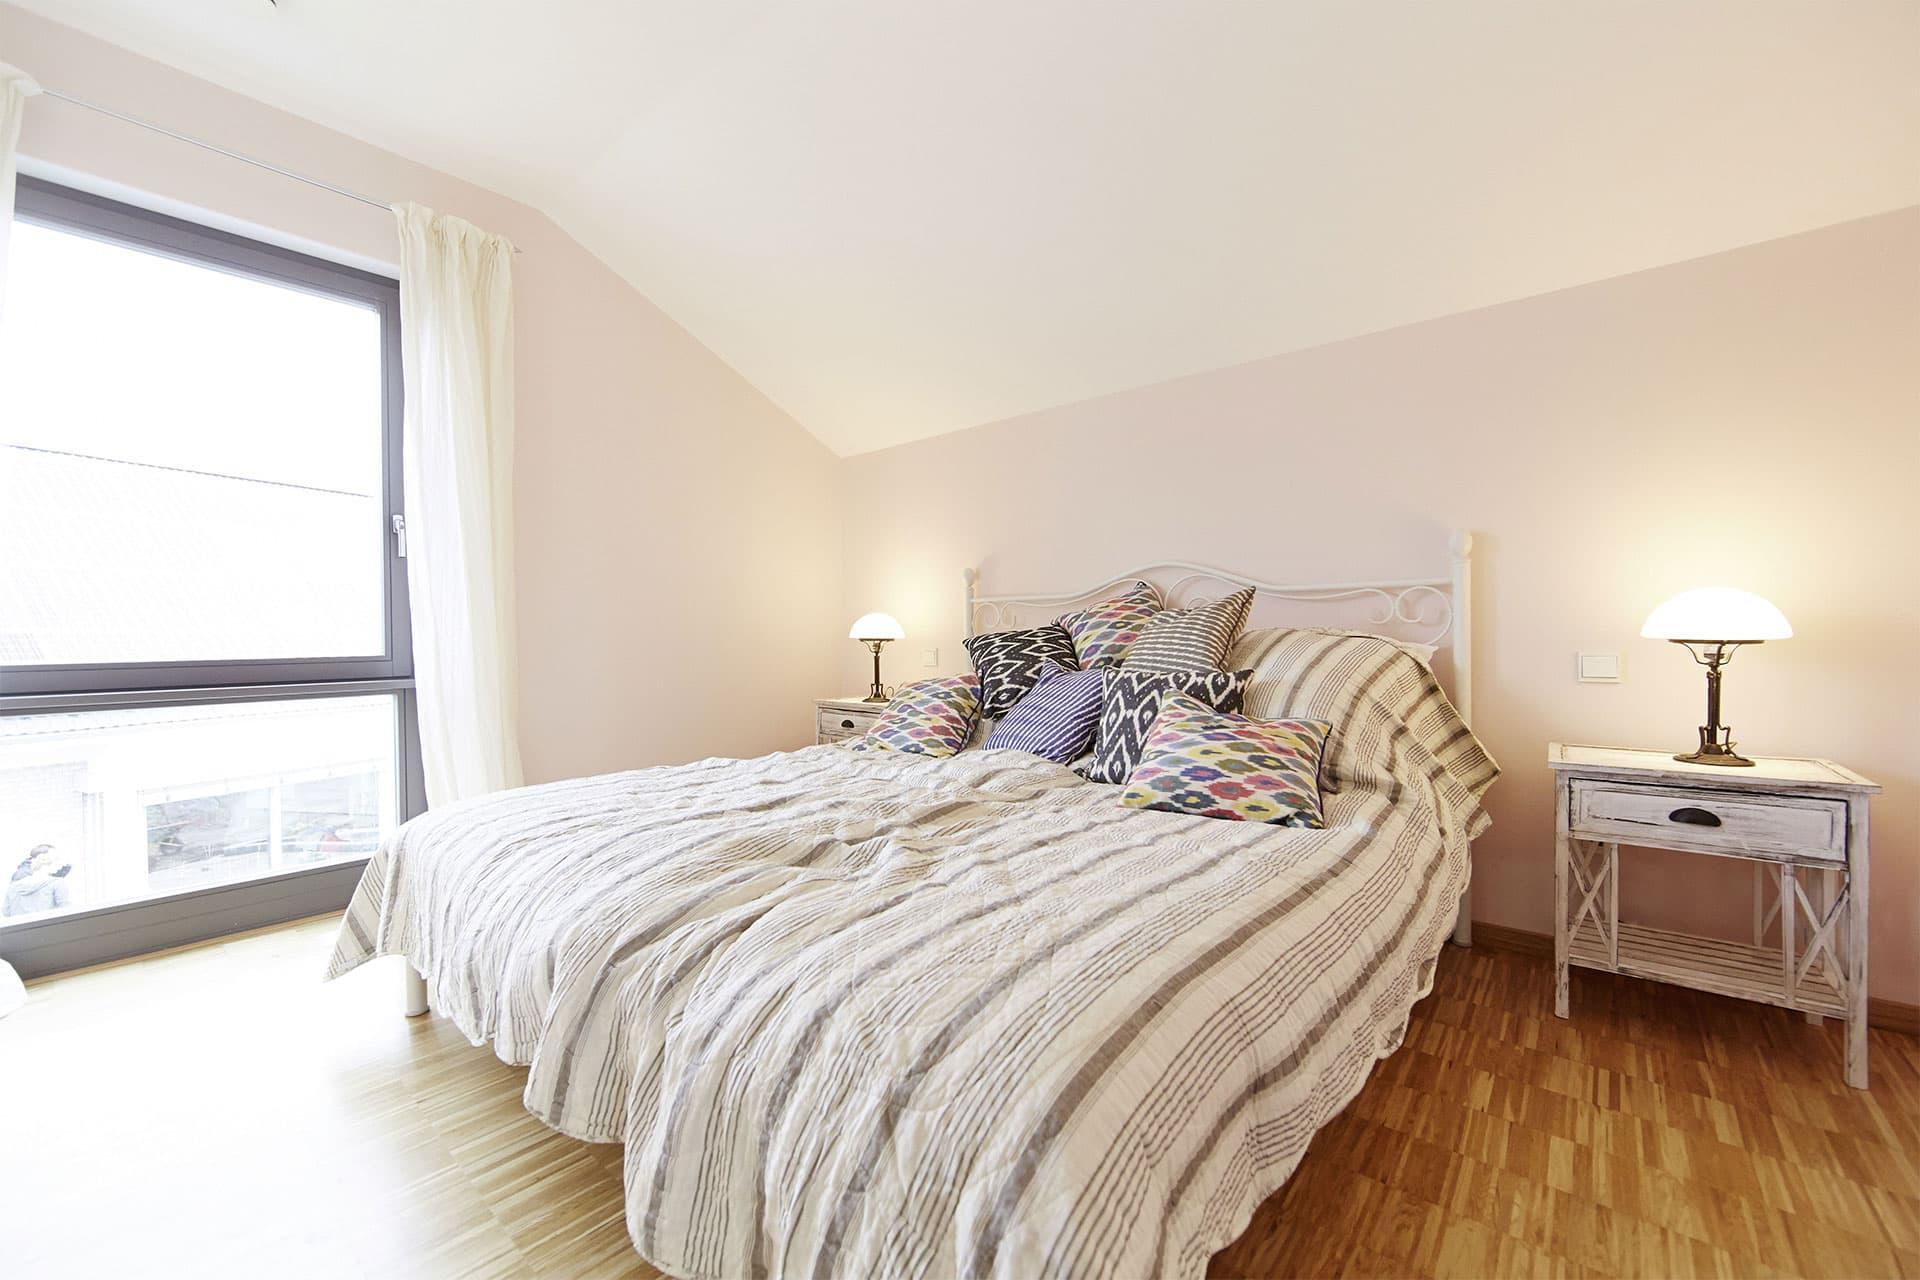 gussek haus musterhaus 39 isabella 39 in wuppertal. Black Bedroom Furniture Sets. Home Design Ideas